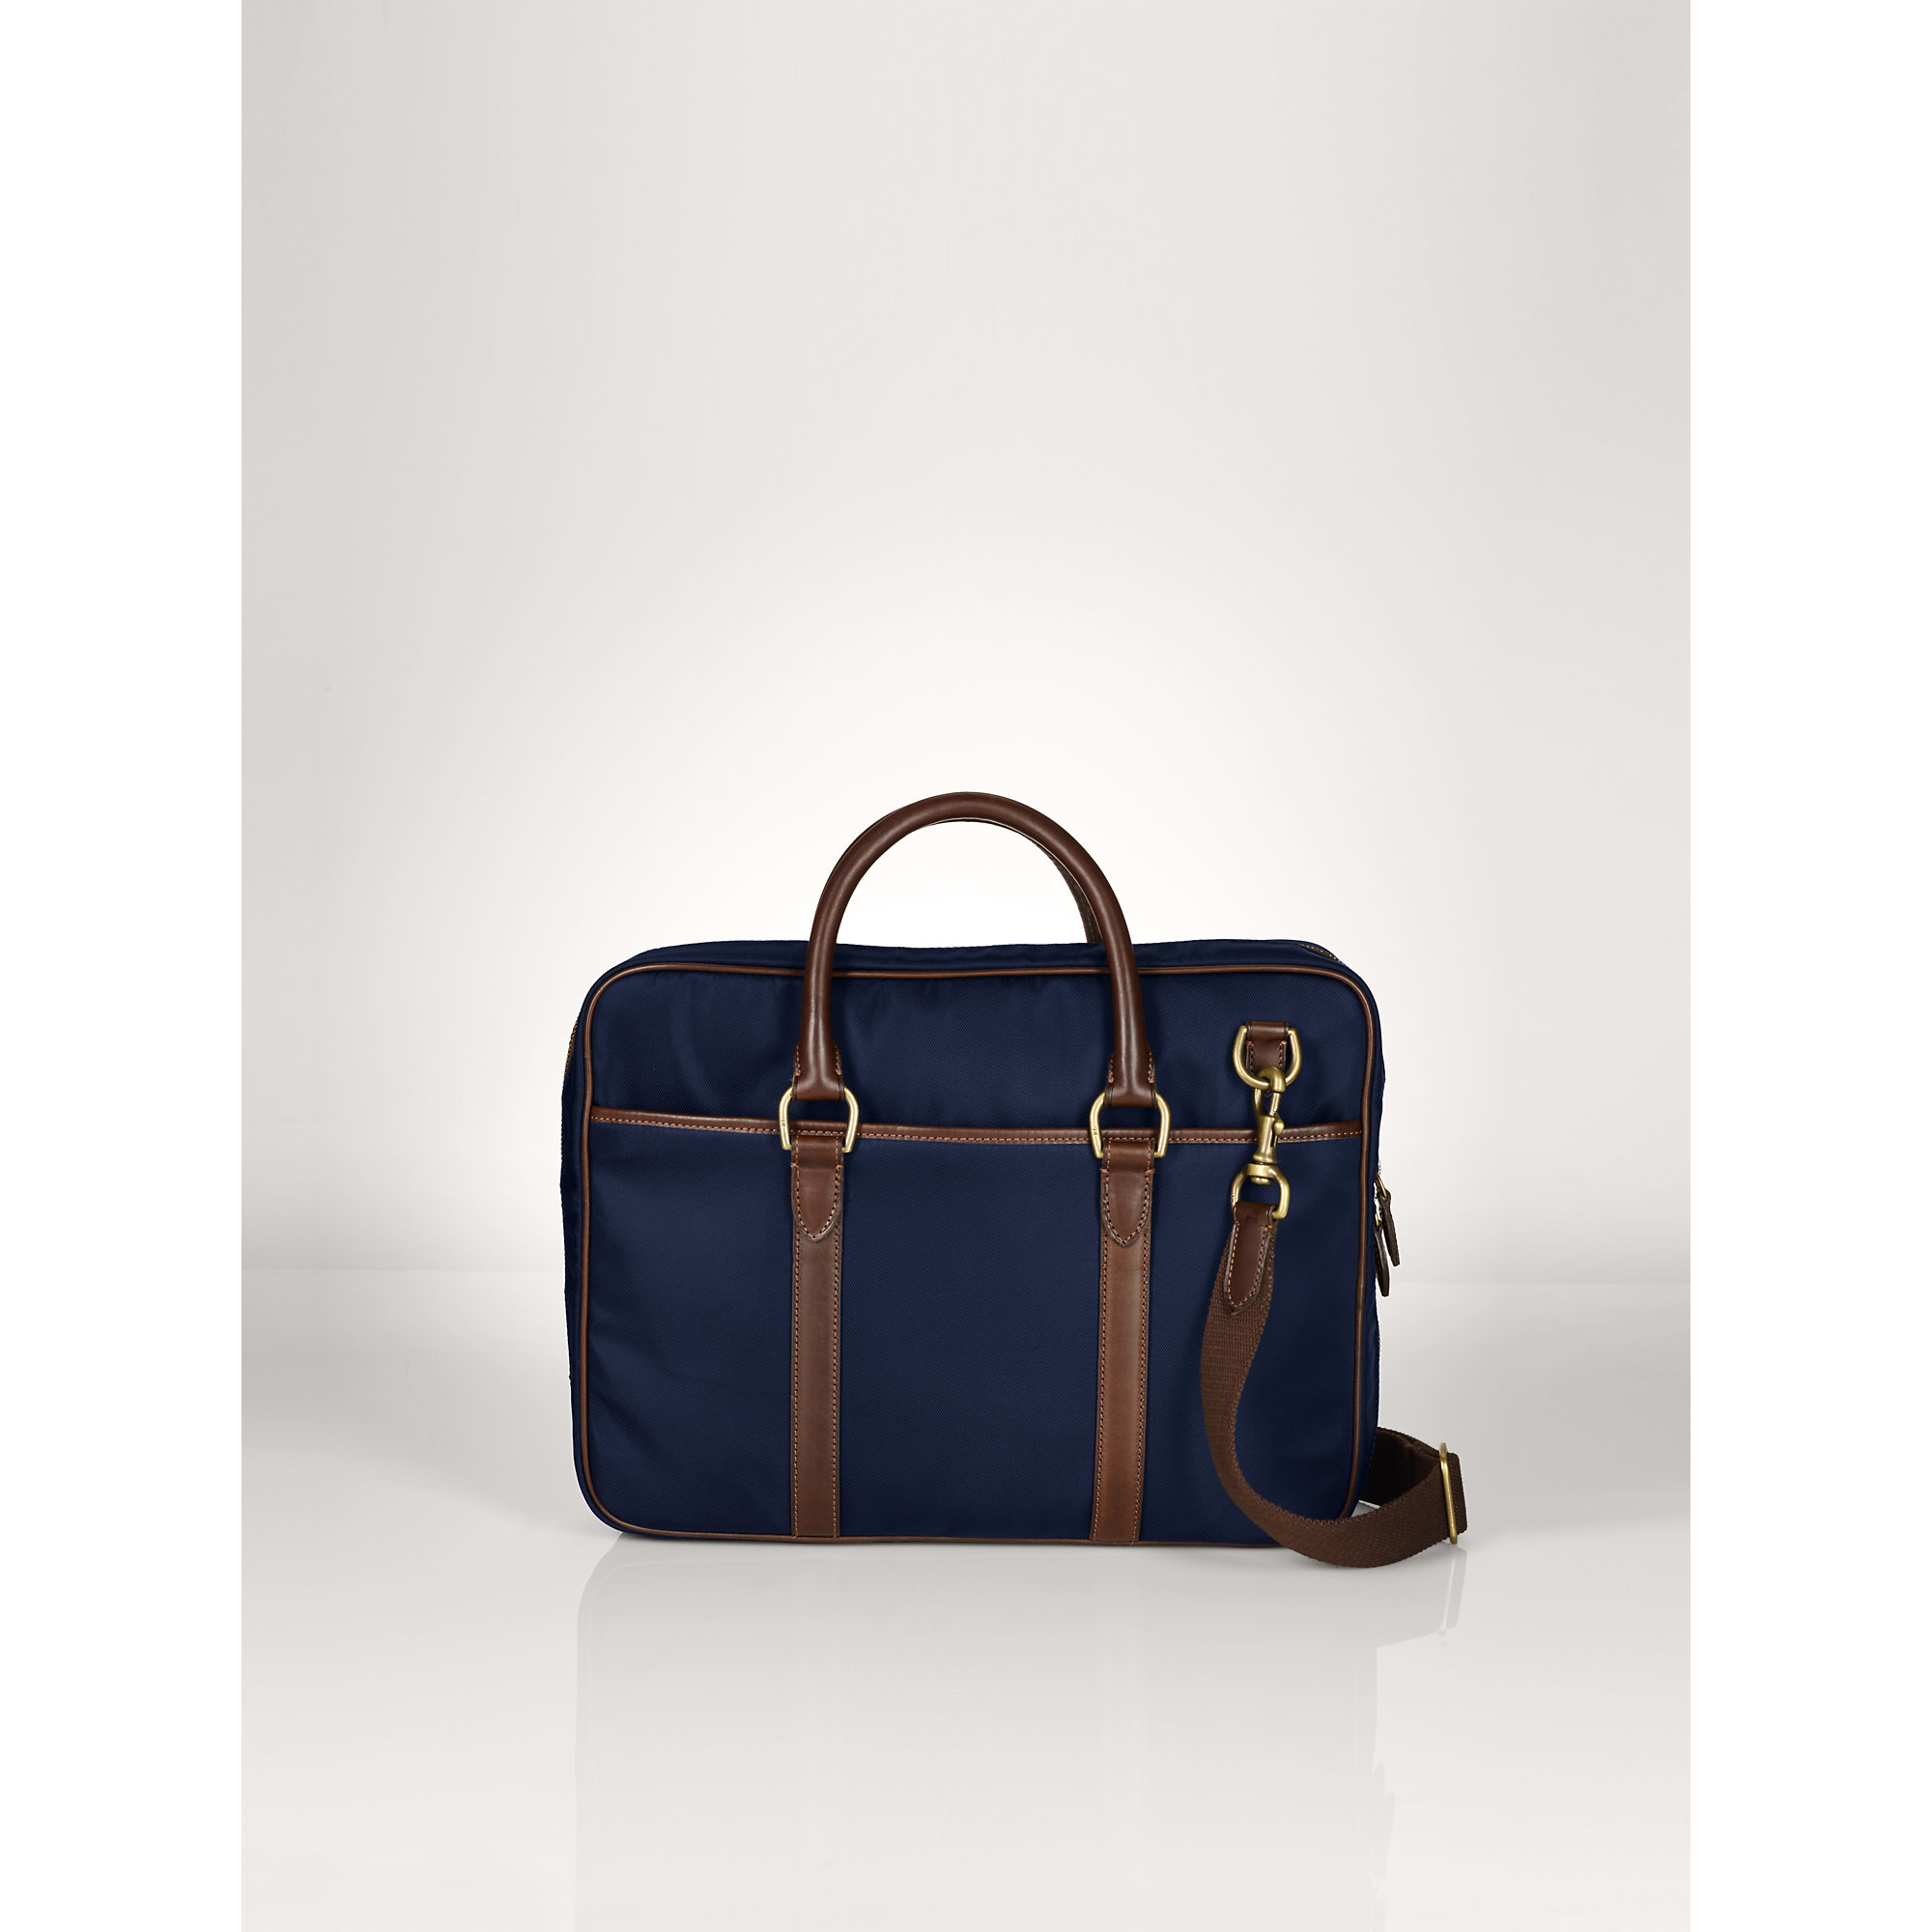 ... discount lyst ralph lauren nylon commuter bag in blue for men 17b6e  0e45b dbbb0e36d2465